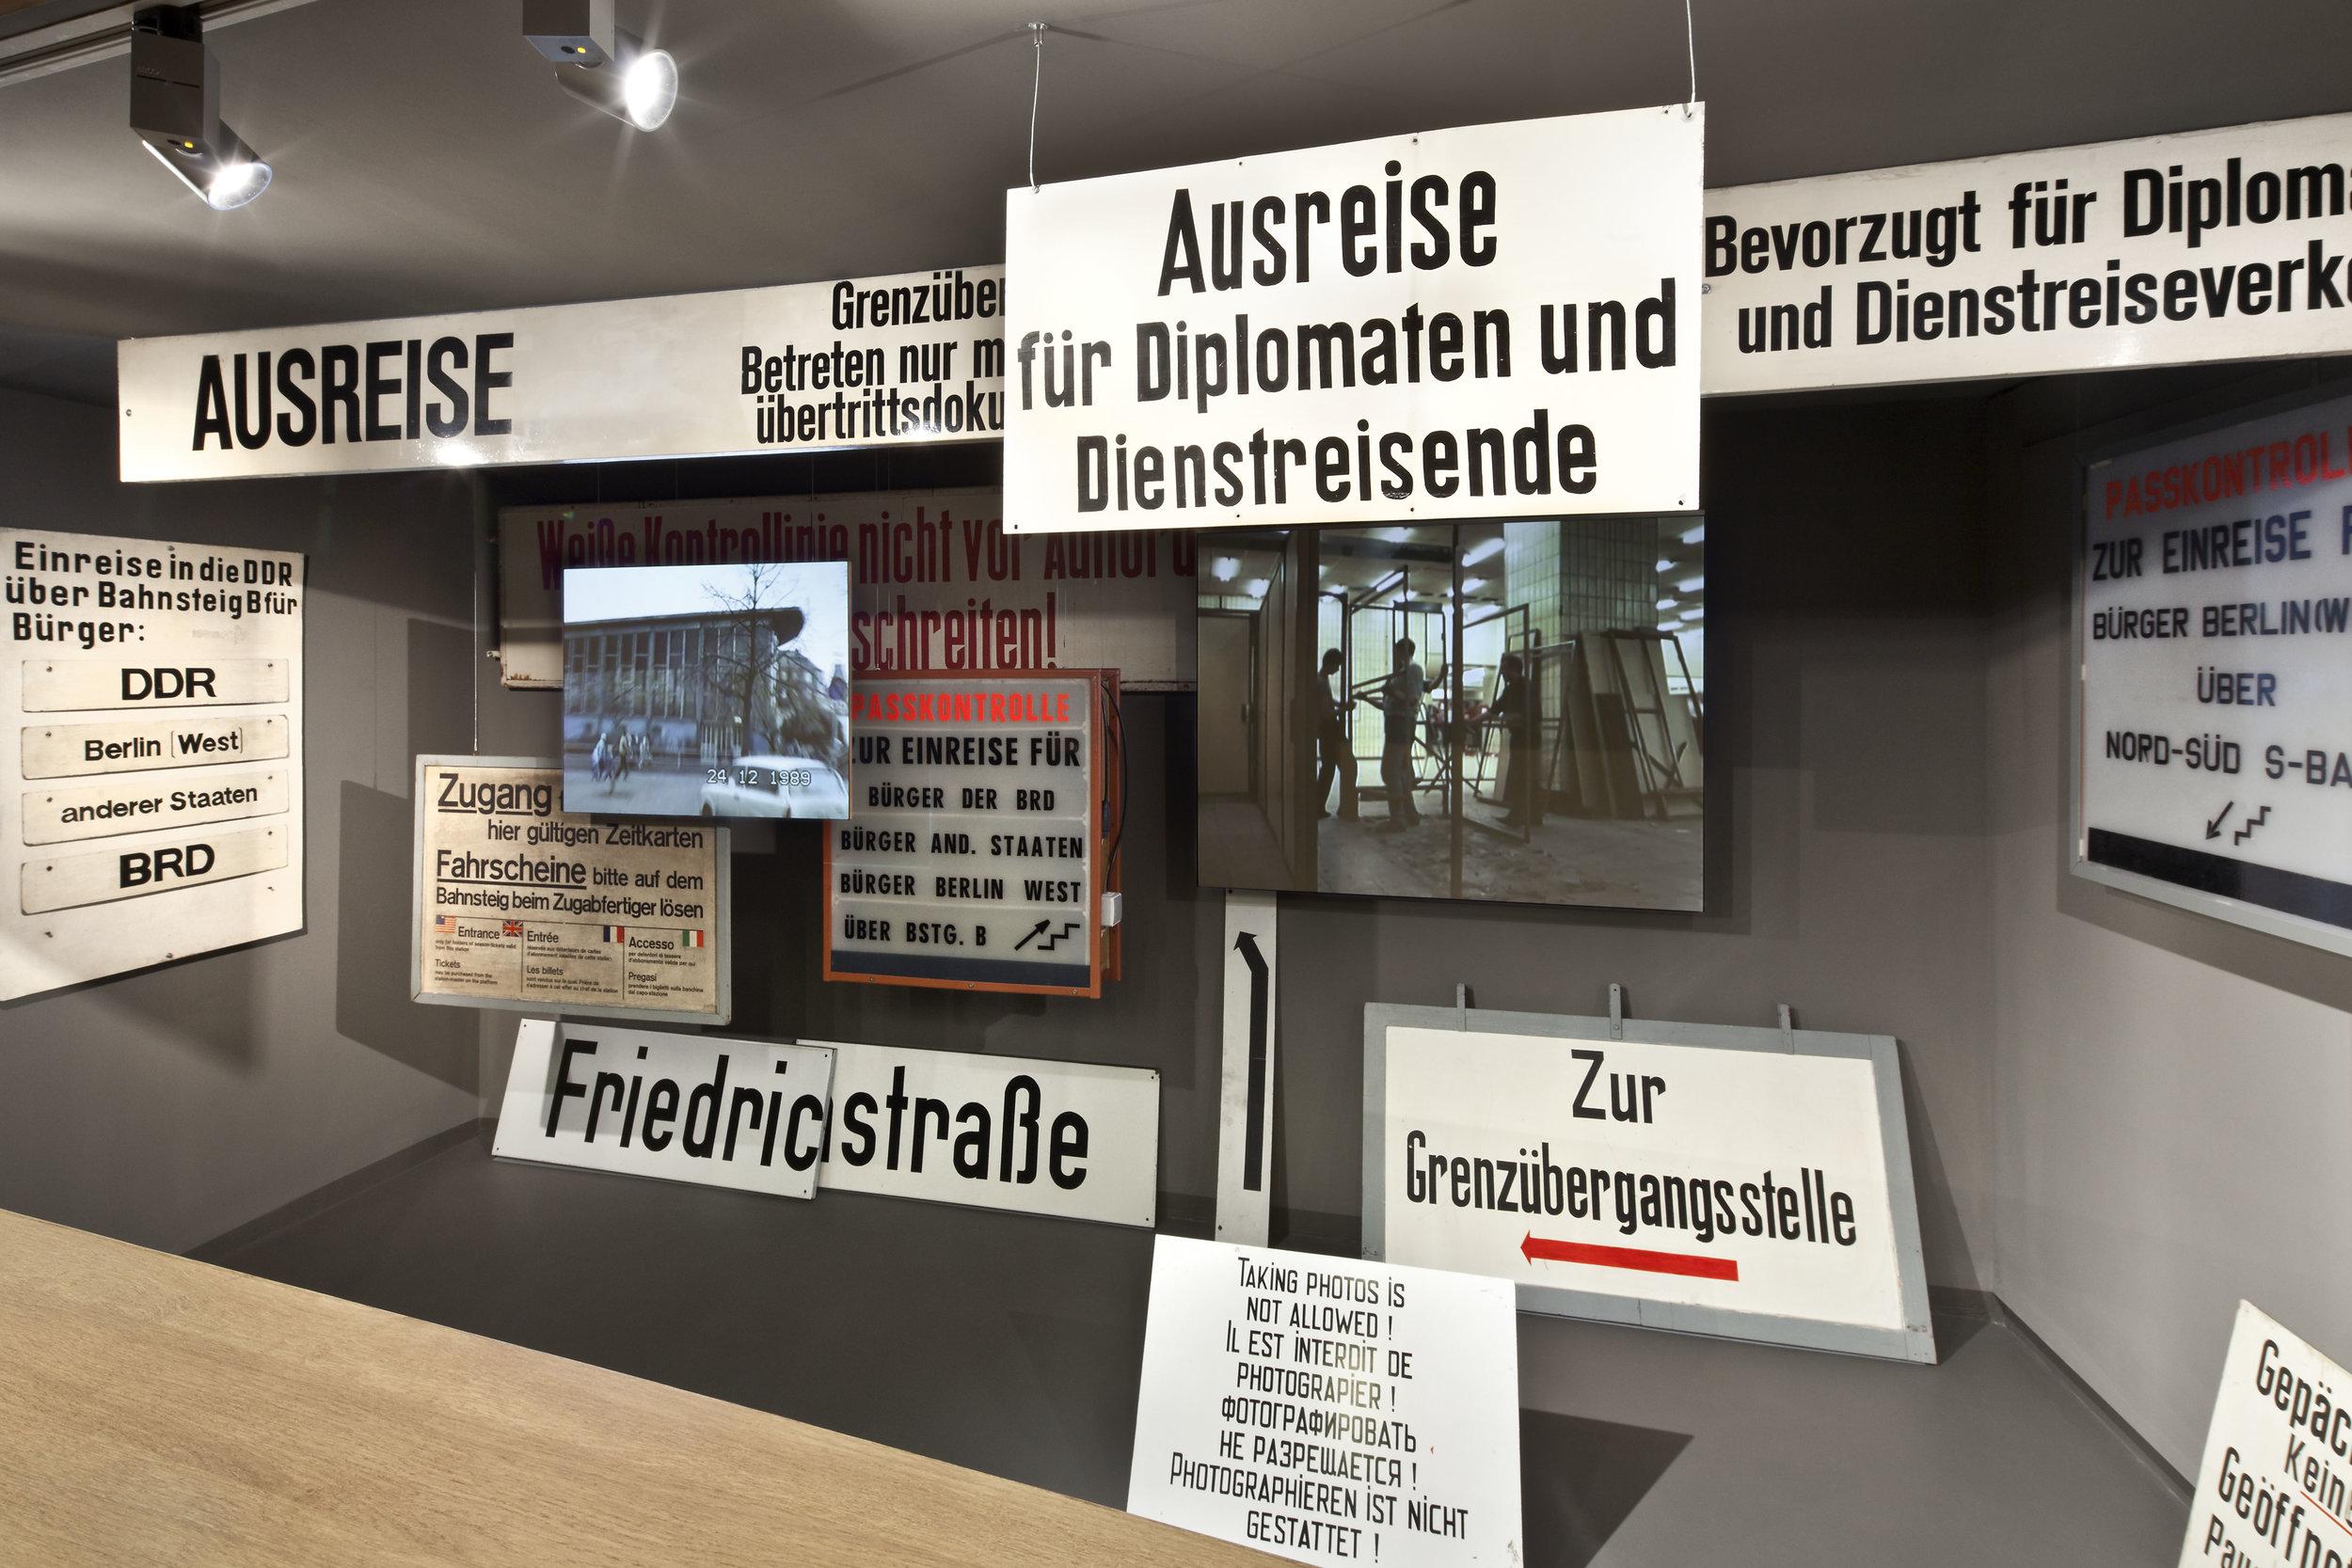 traenenpalast_museum-exhibition-design_coordination-berlin_05.jpg